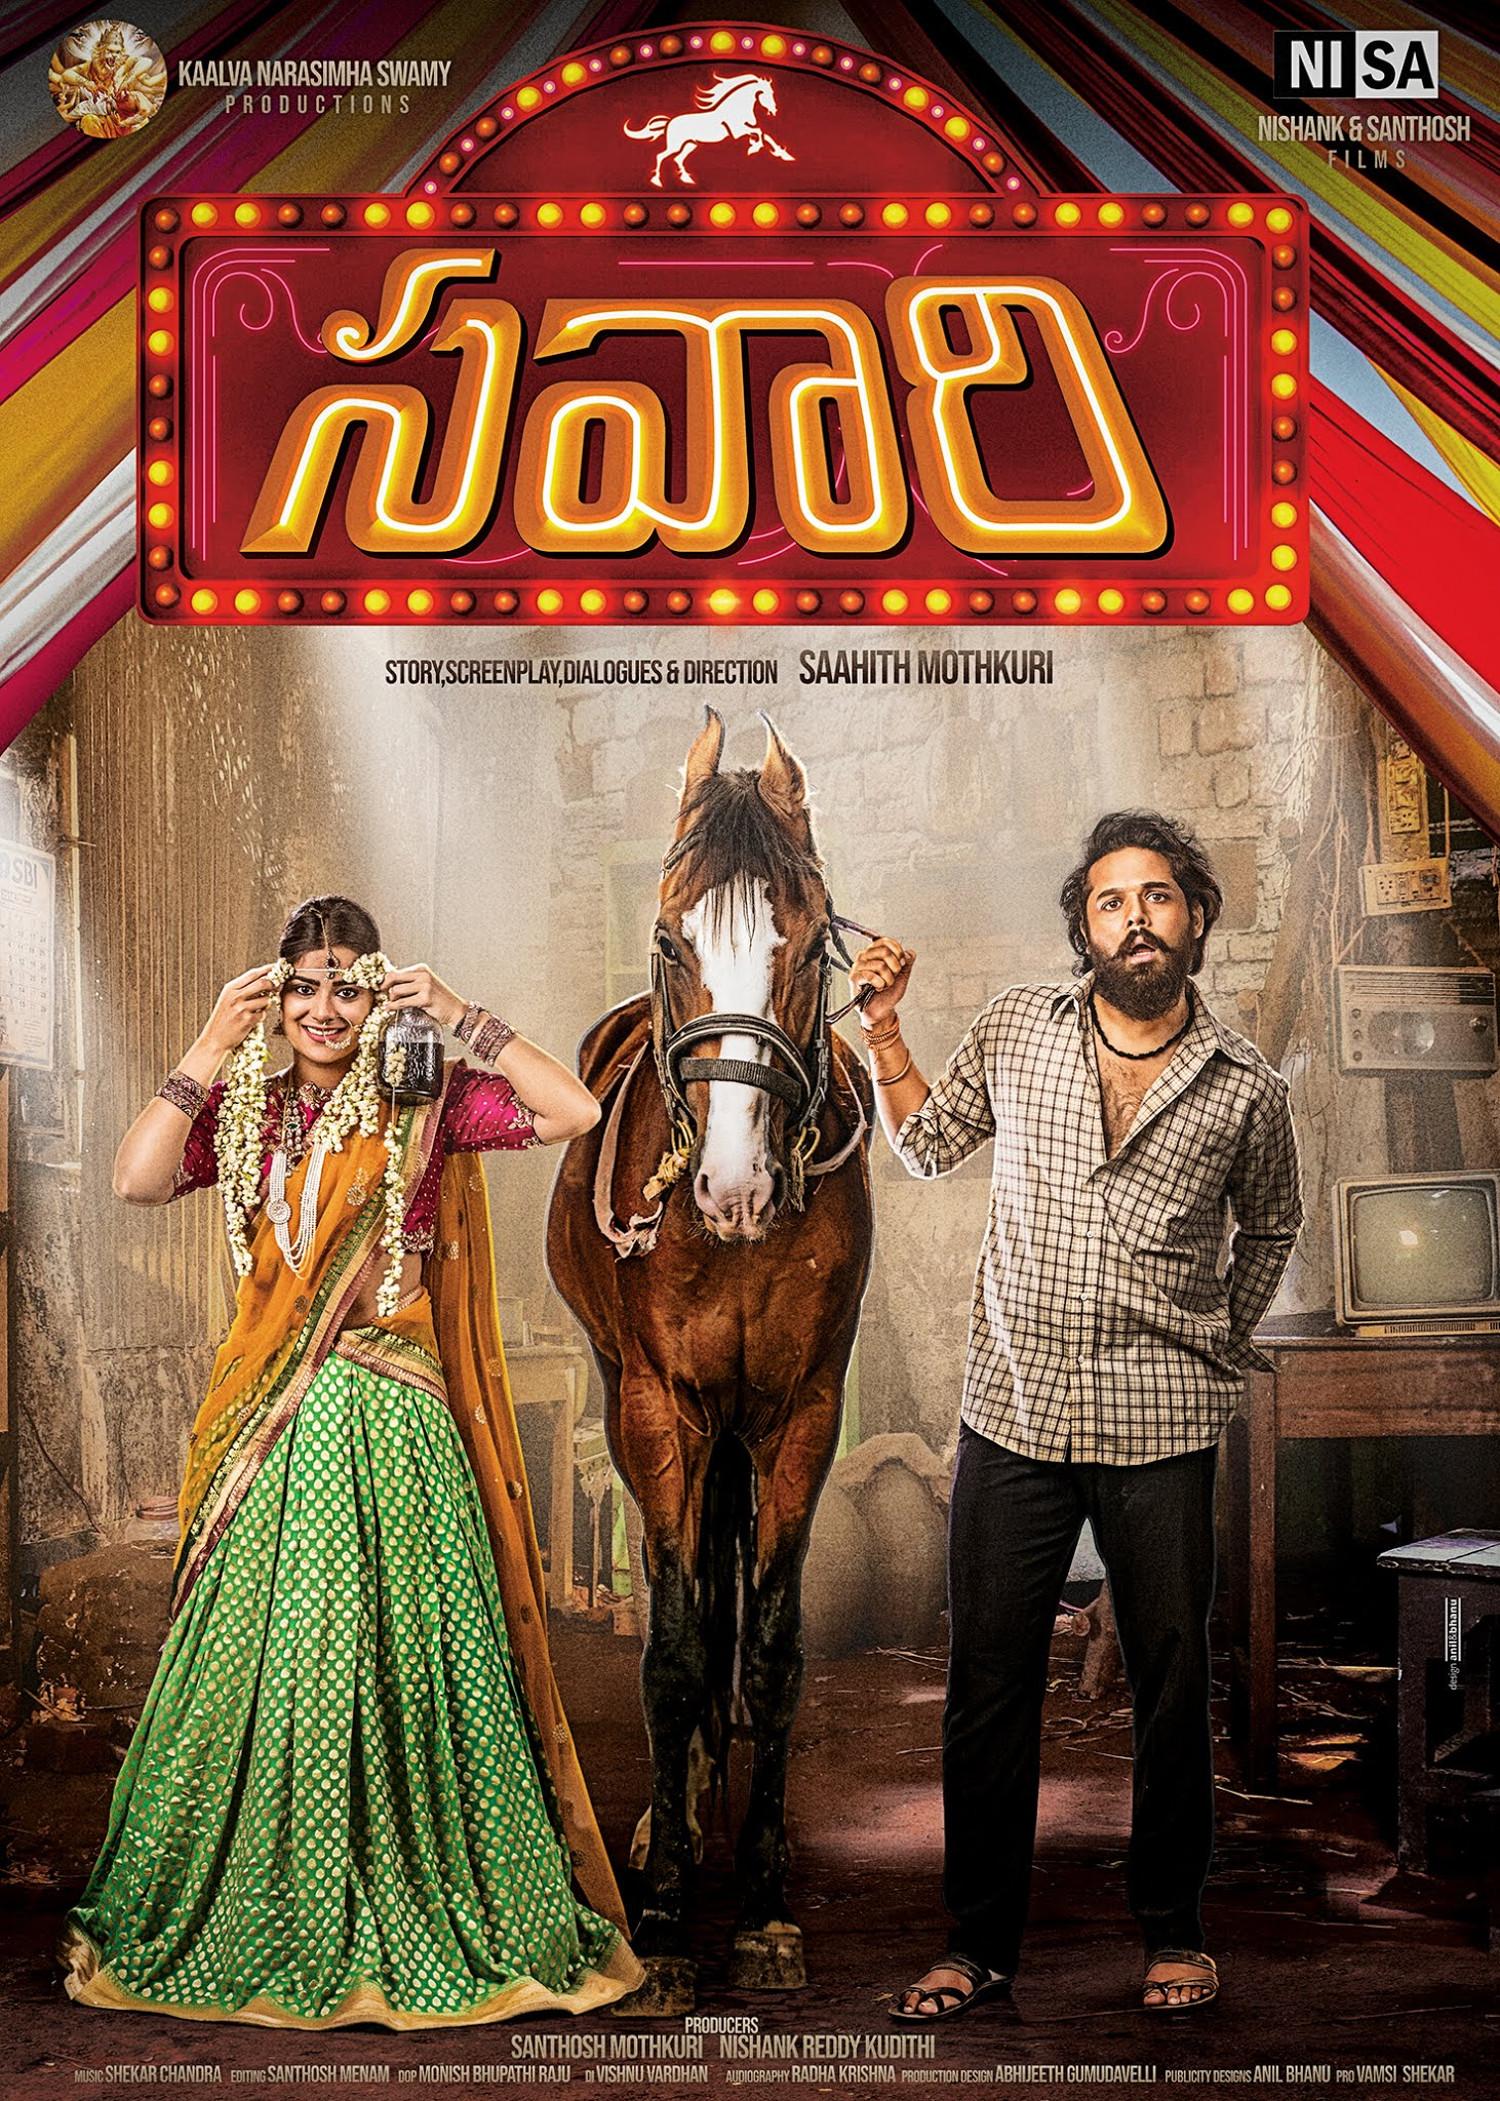 Priyanka Sharma & Nandu @ Savaari Movie First Look Poster HD | New